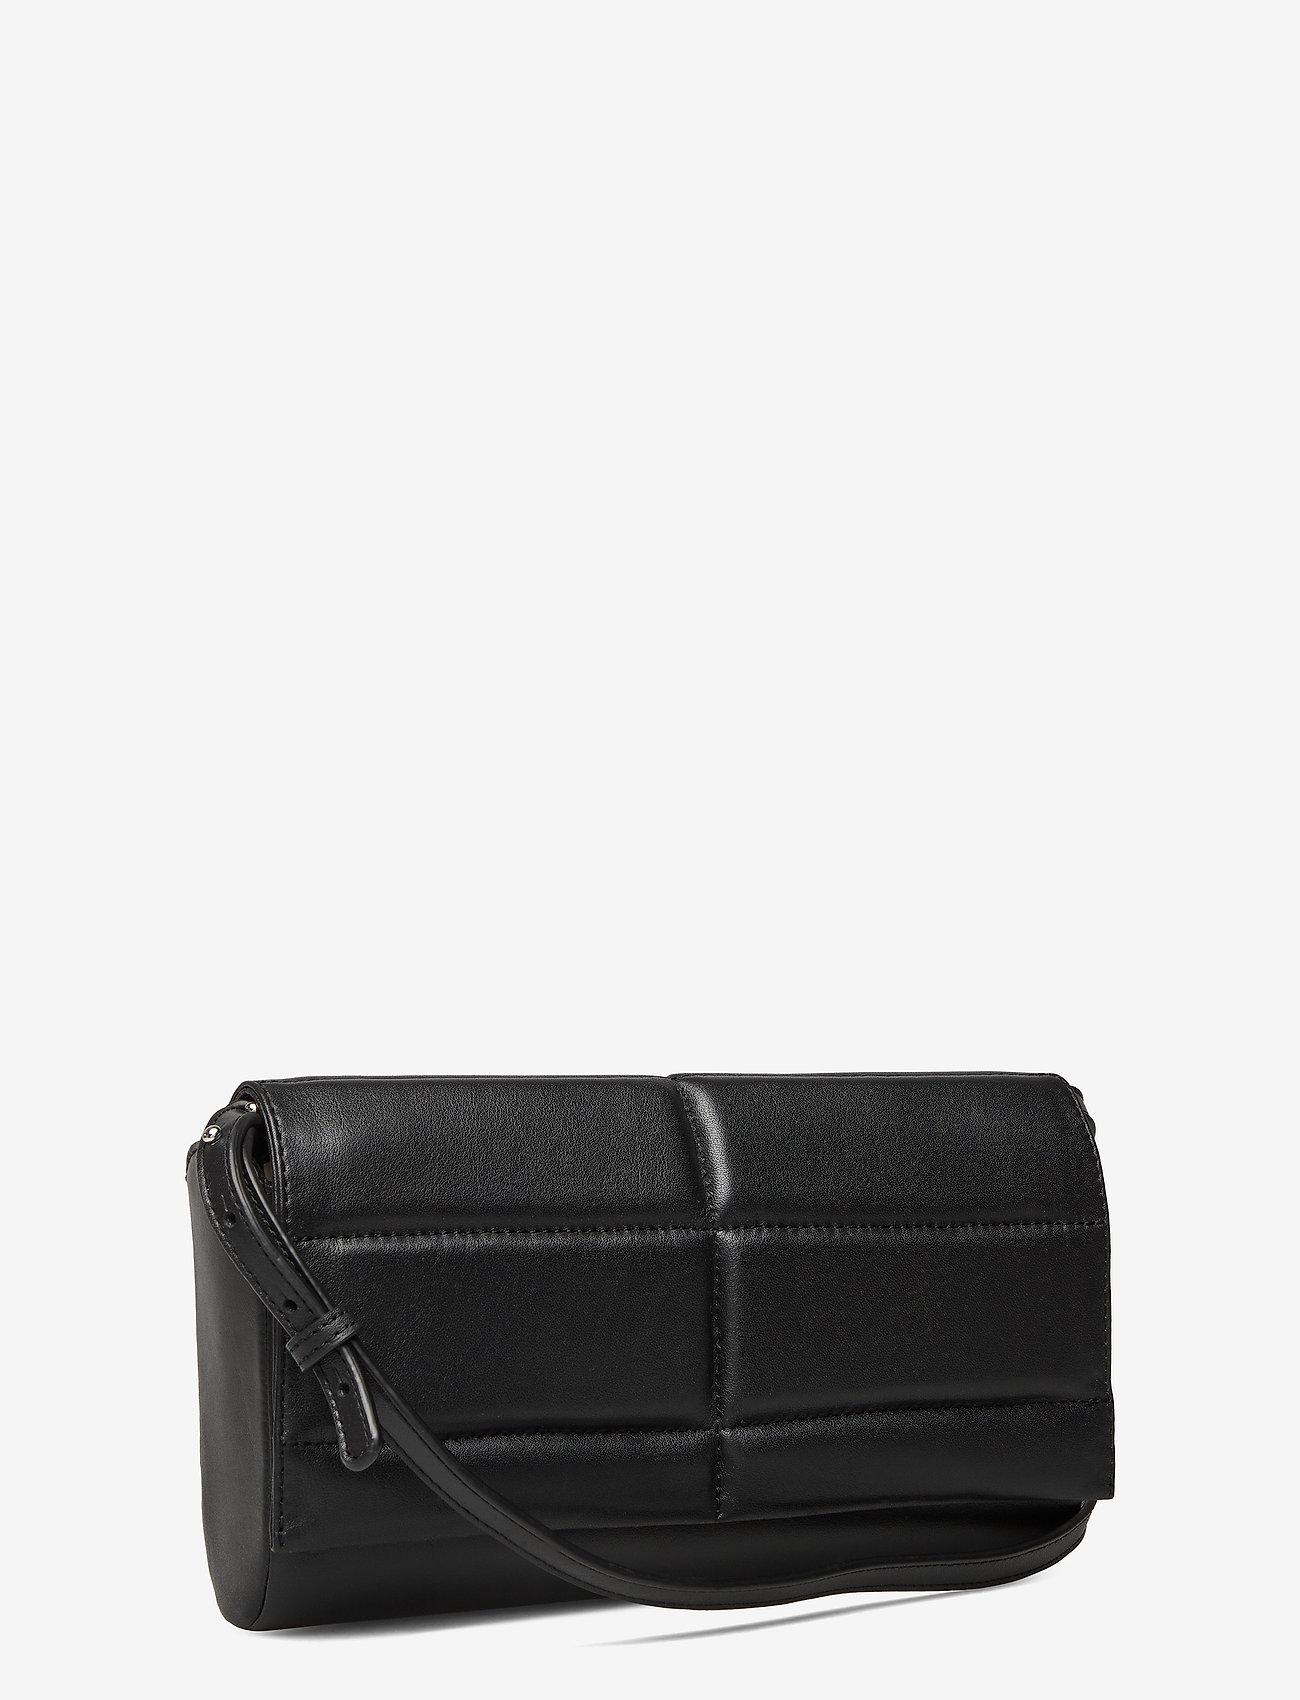 VAGABOND - MALIBU - crossbody bags - black - 2